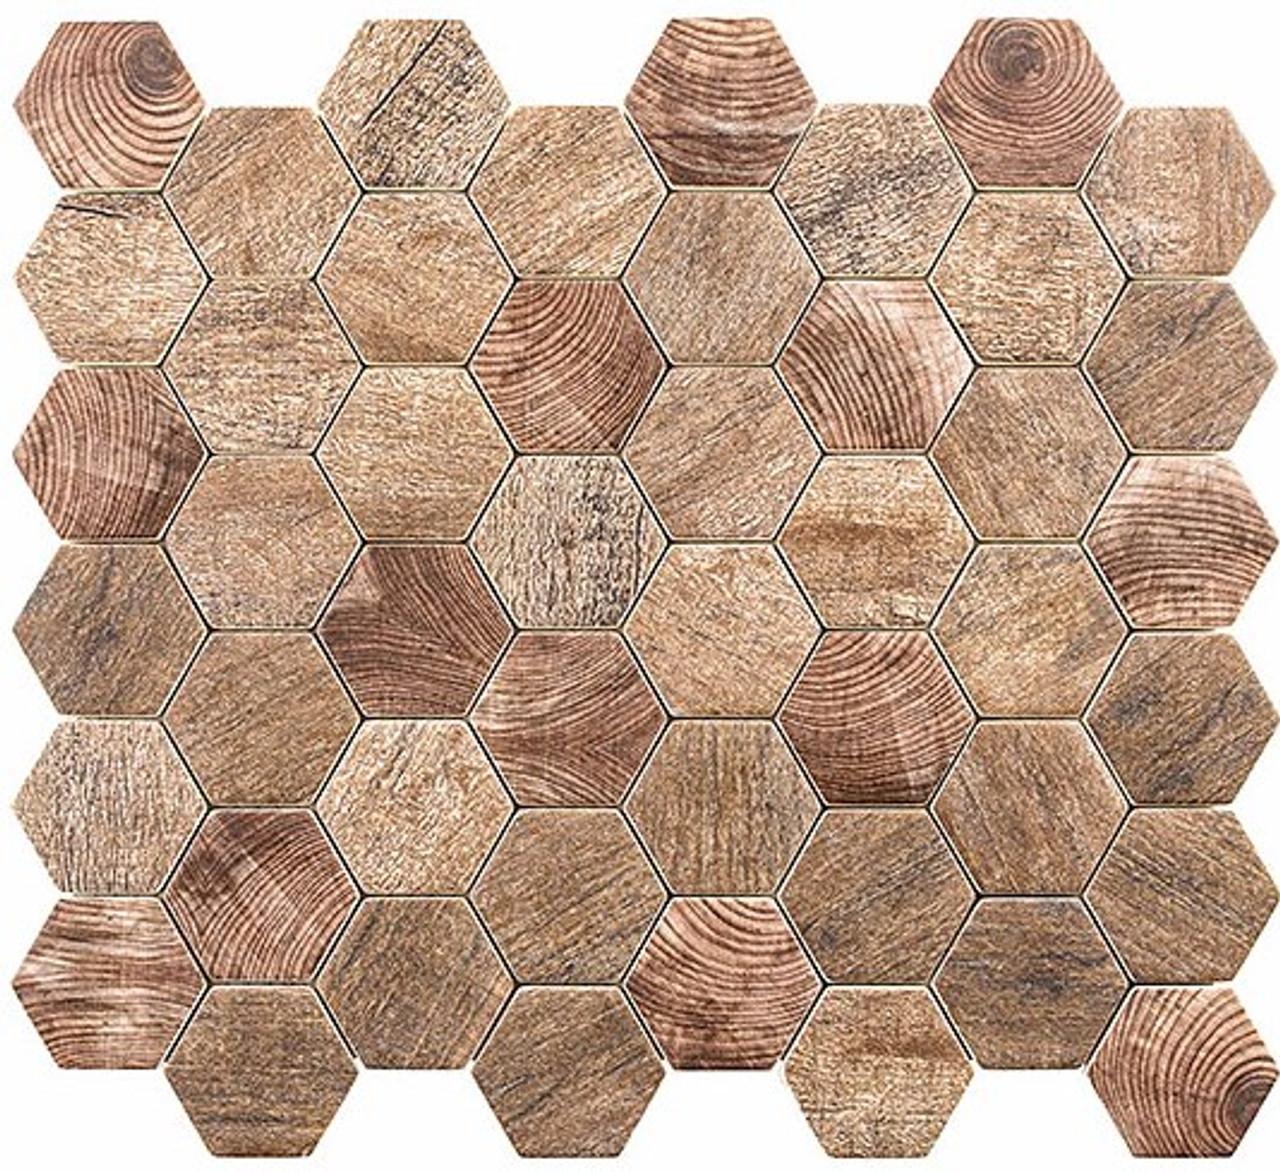 Bella Glass Tiles Woodland Series Autumn Maple